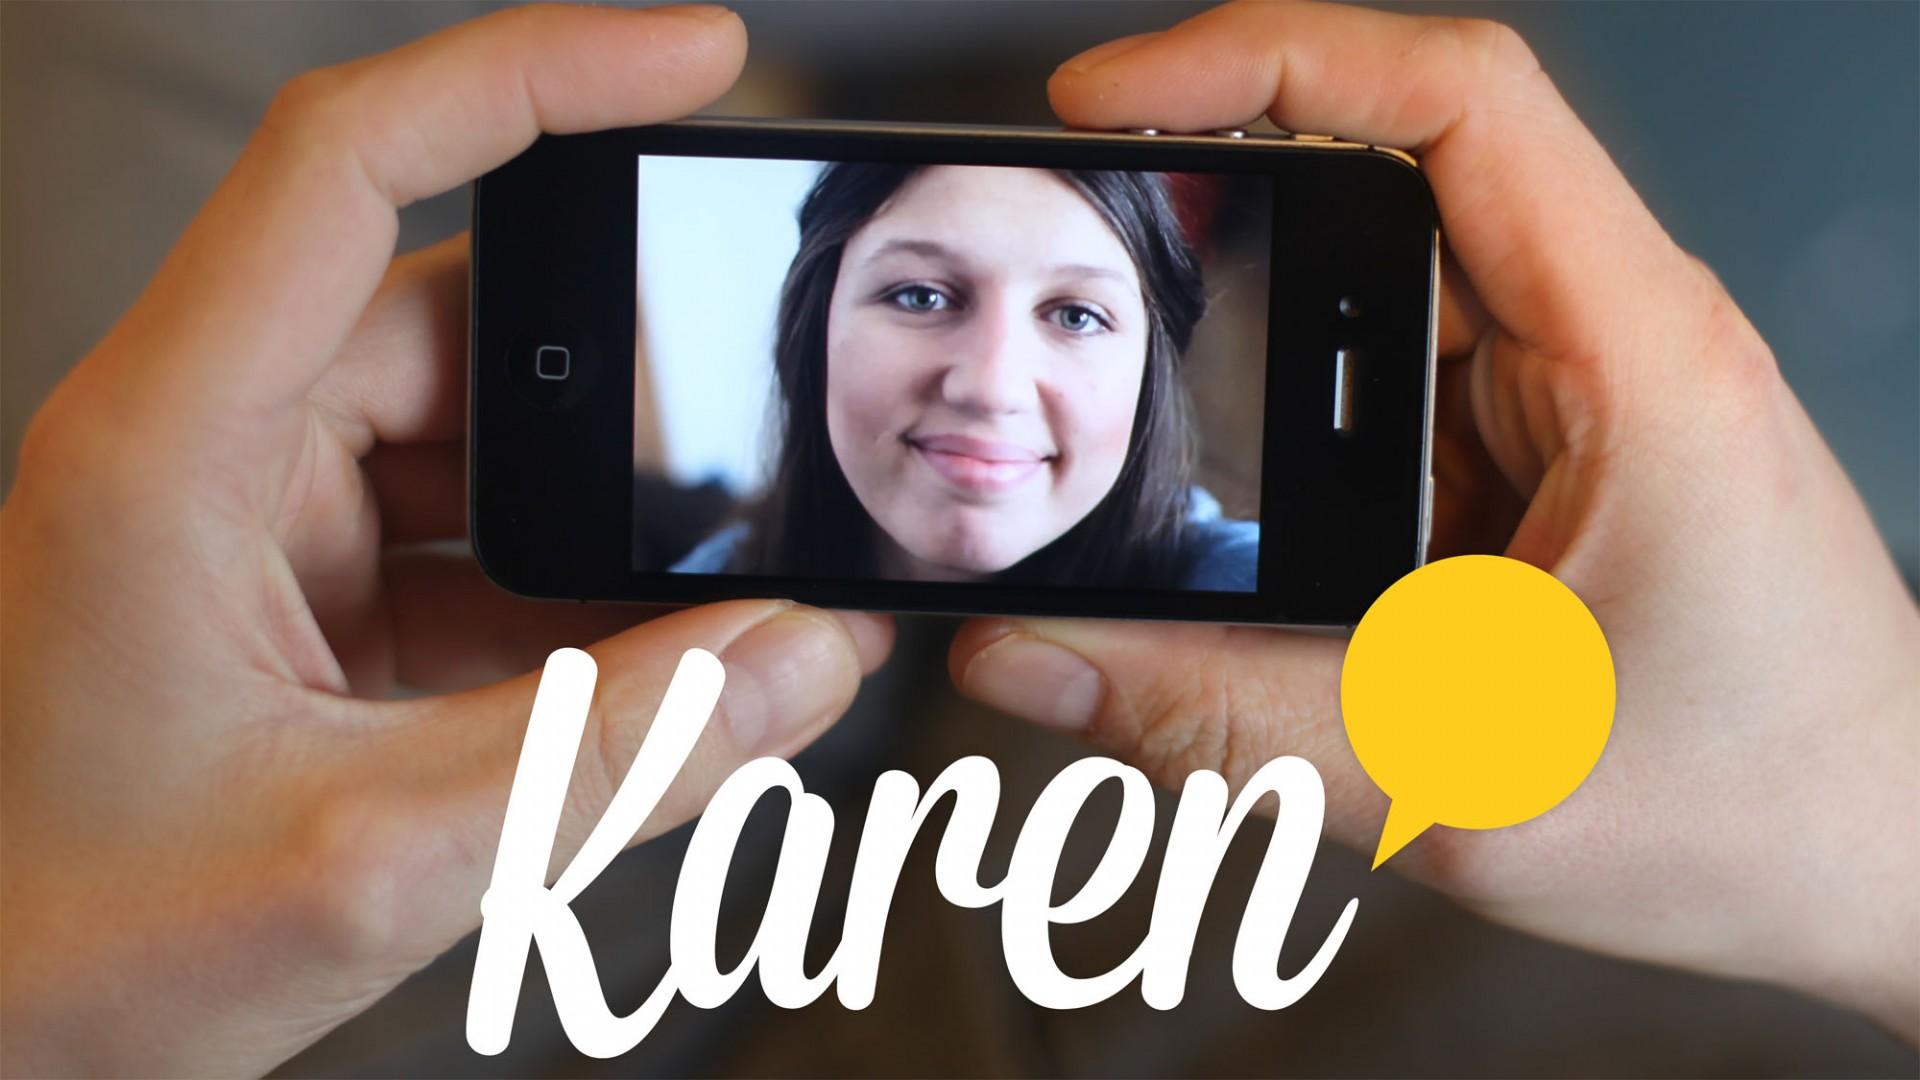 Thank you for Kickstarting Karen